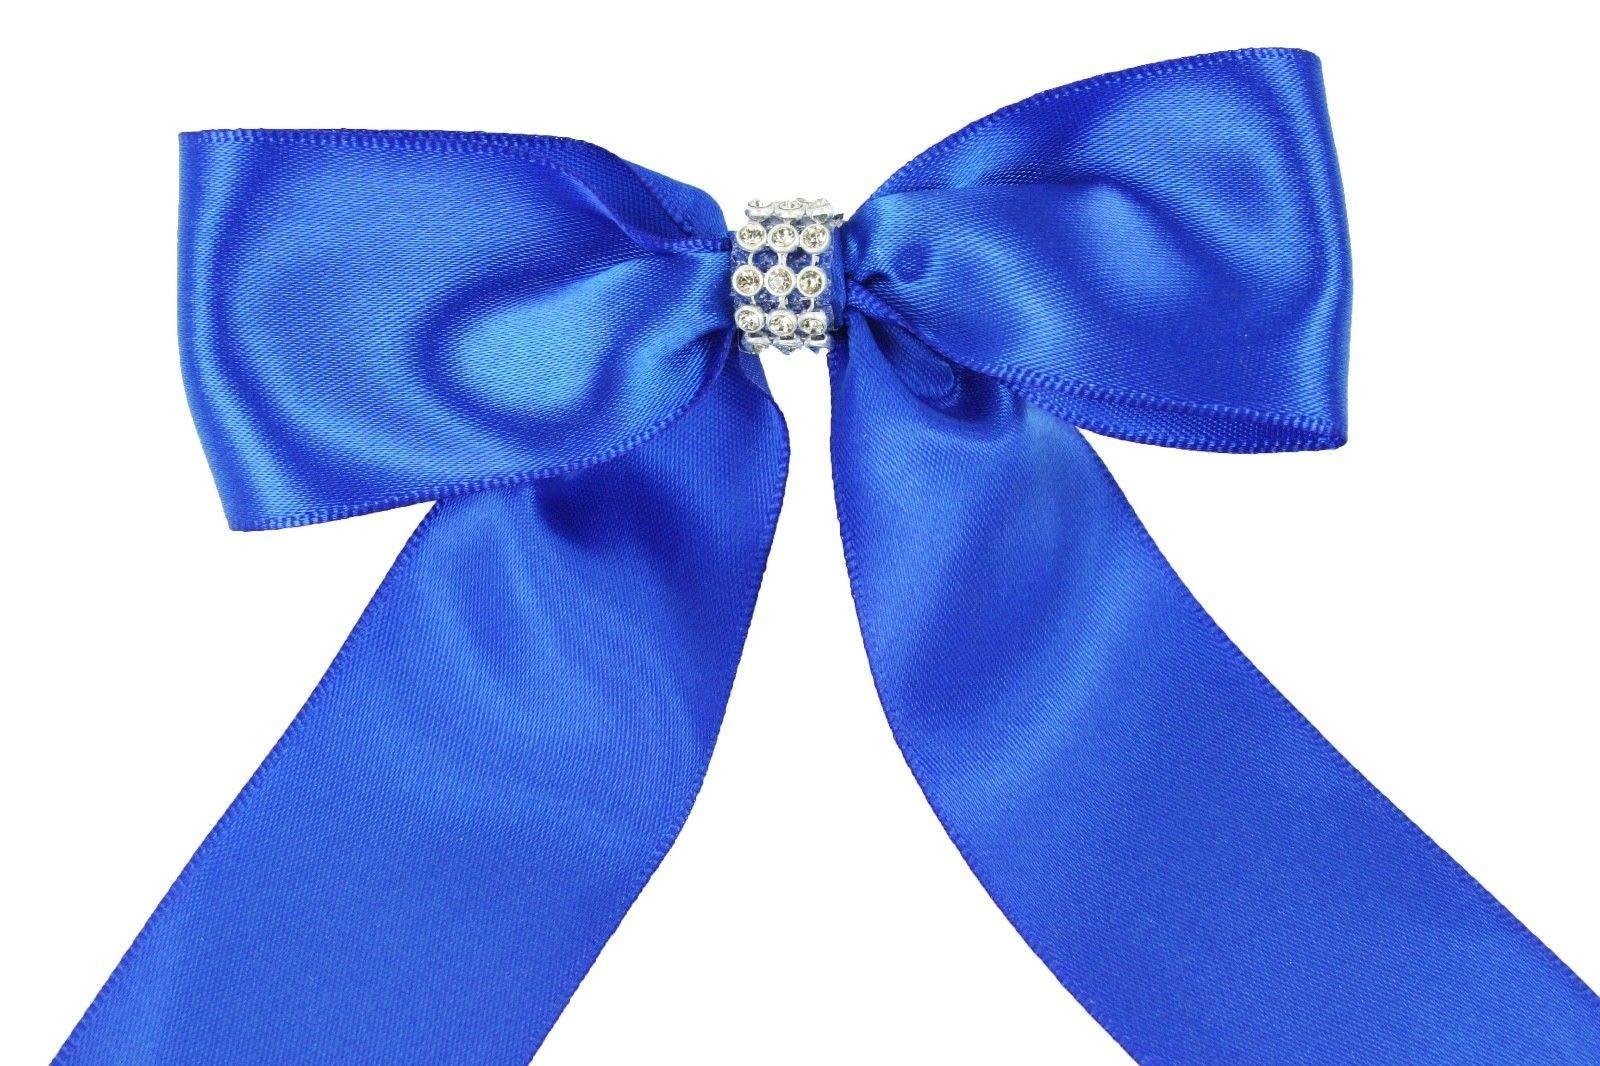 Bright Sun Royal Blue (Set of 10) Pre-Made 1-1/2'' Satin Bows Rhinestone Center Design with Wire Tie #DPNH